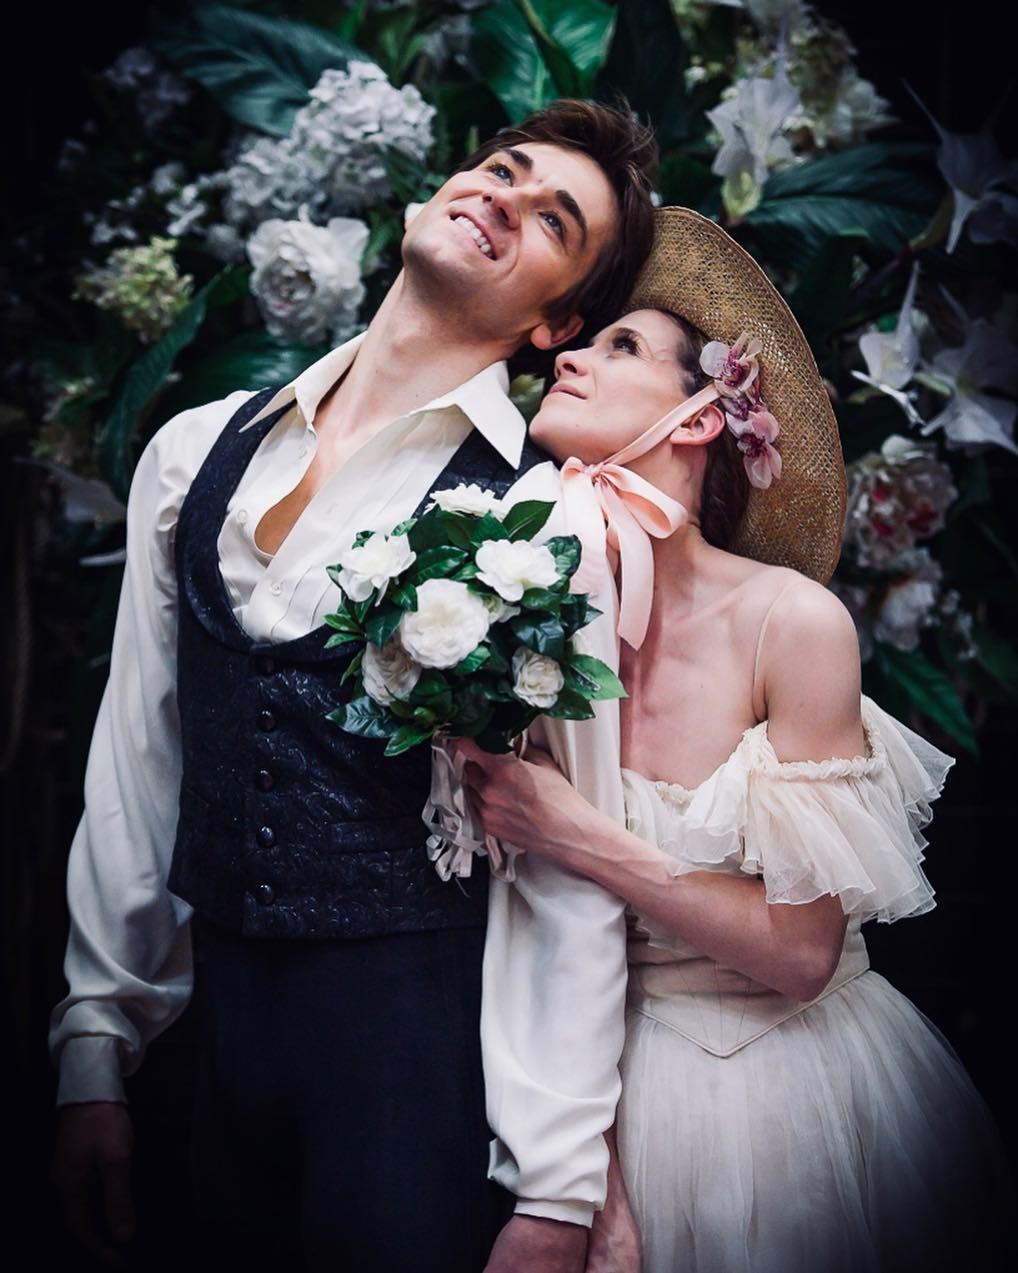 Friedemann Vogel as Armand Duval and Alicia Amatriain as Marguerite Gautier. Photo © Stuttgart Ballet